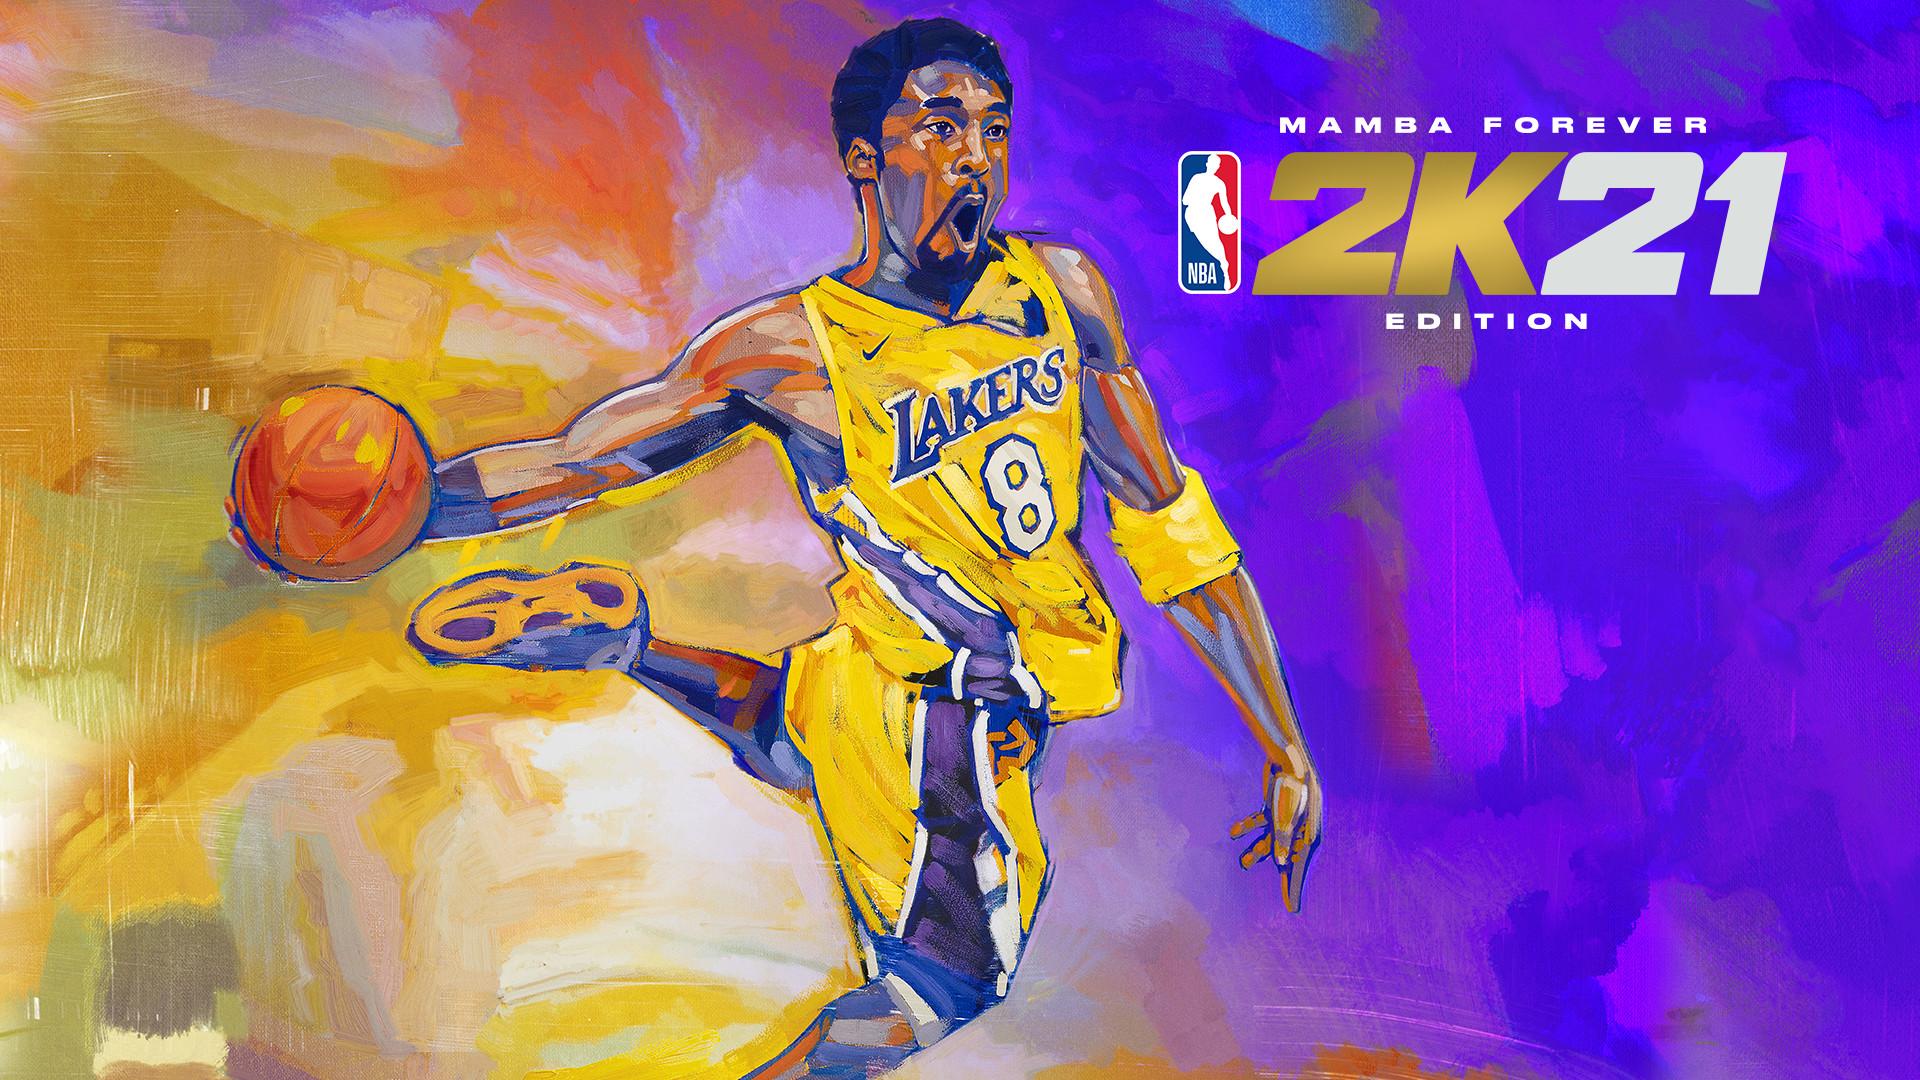 《NBA 2K21》Steam预购开启 标准版售价199元